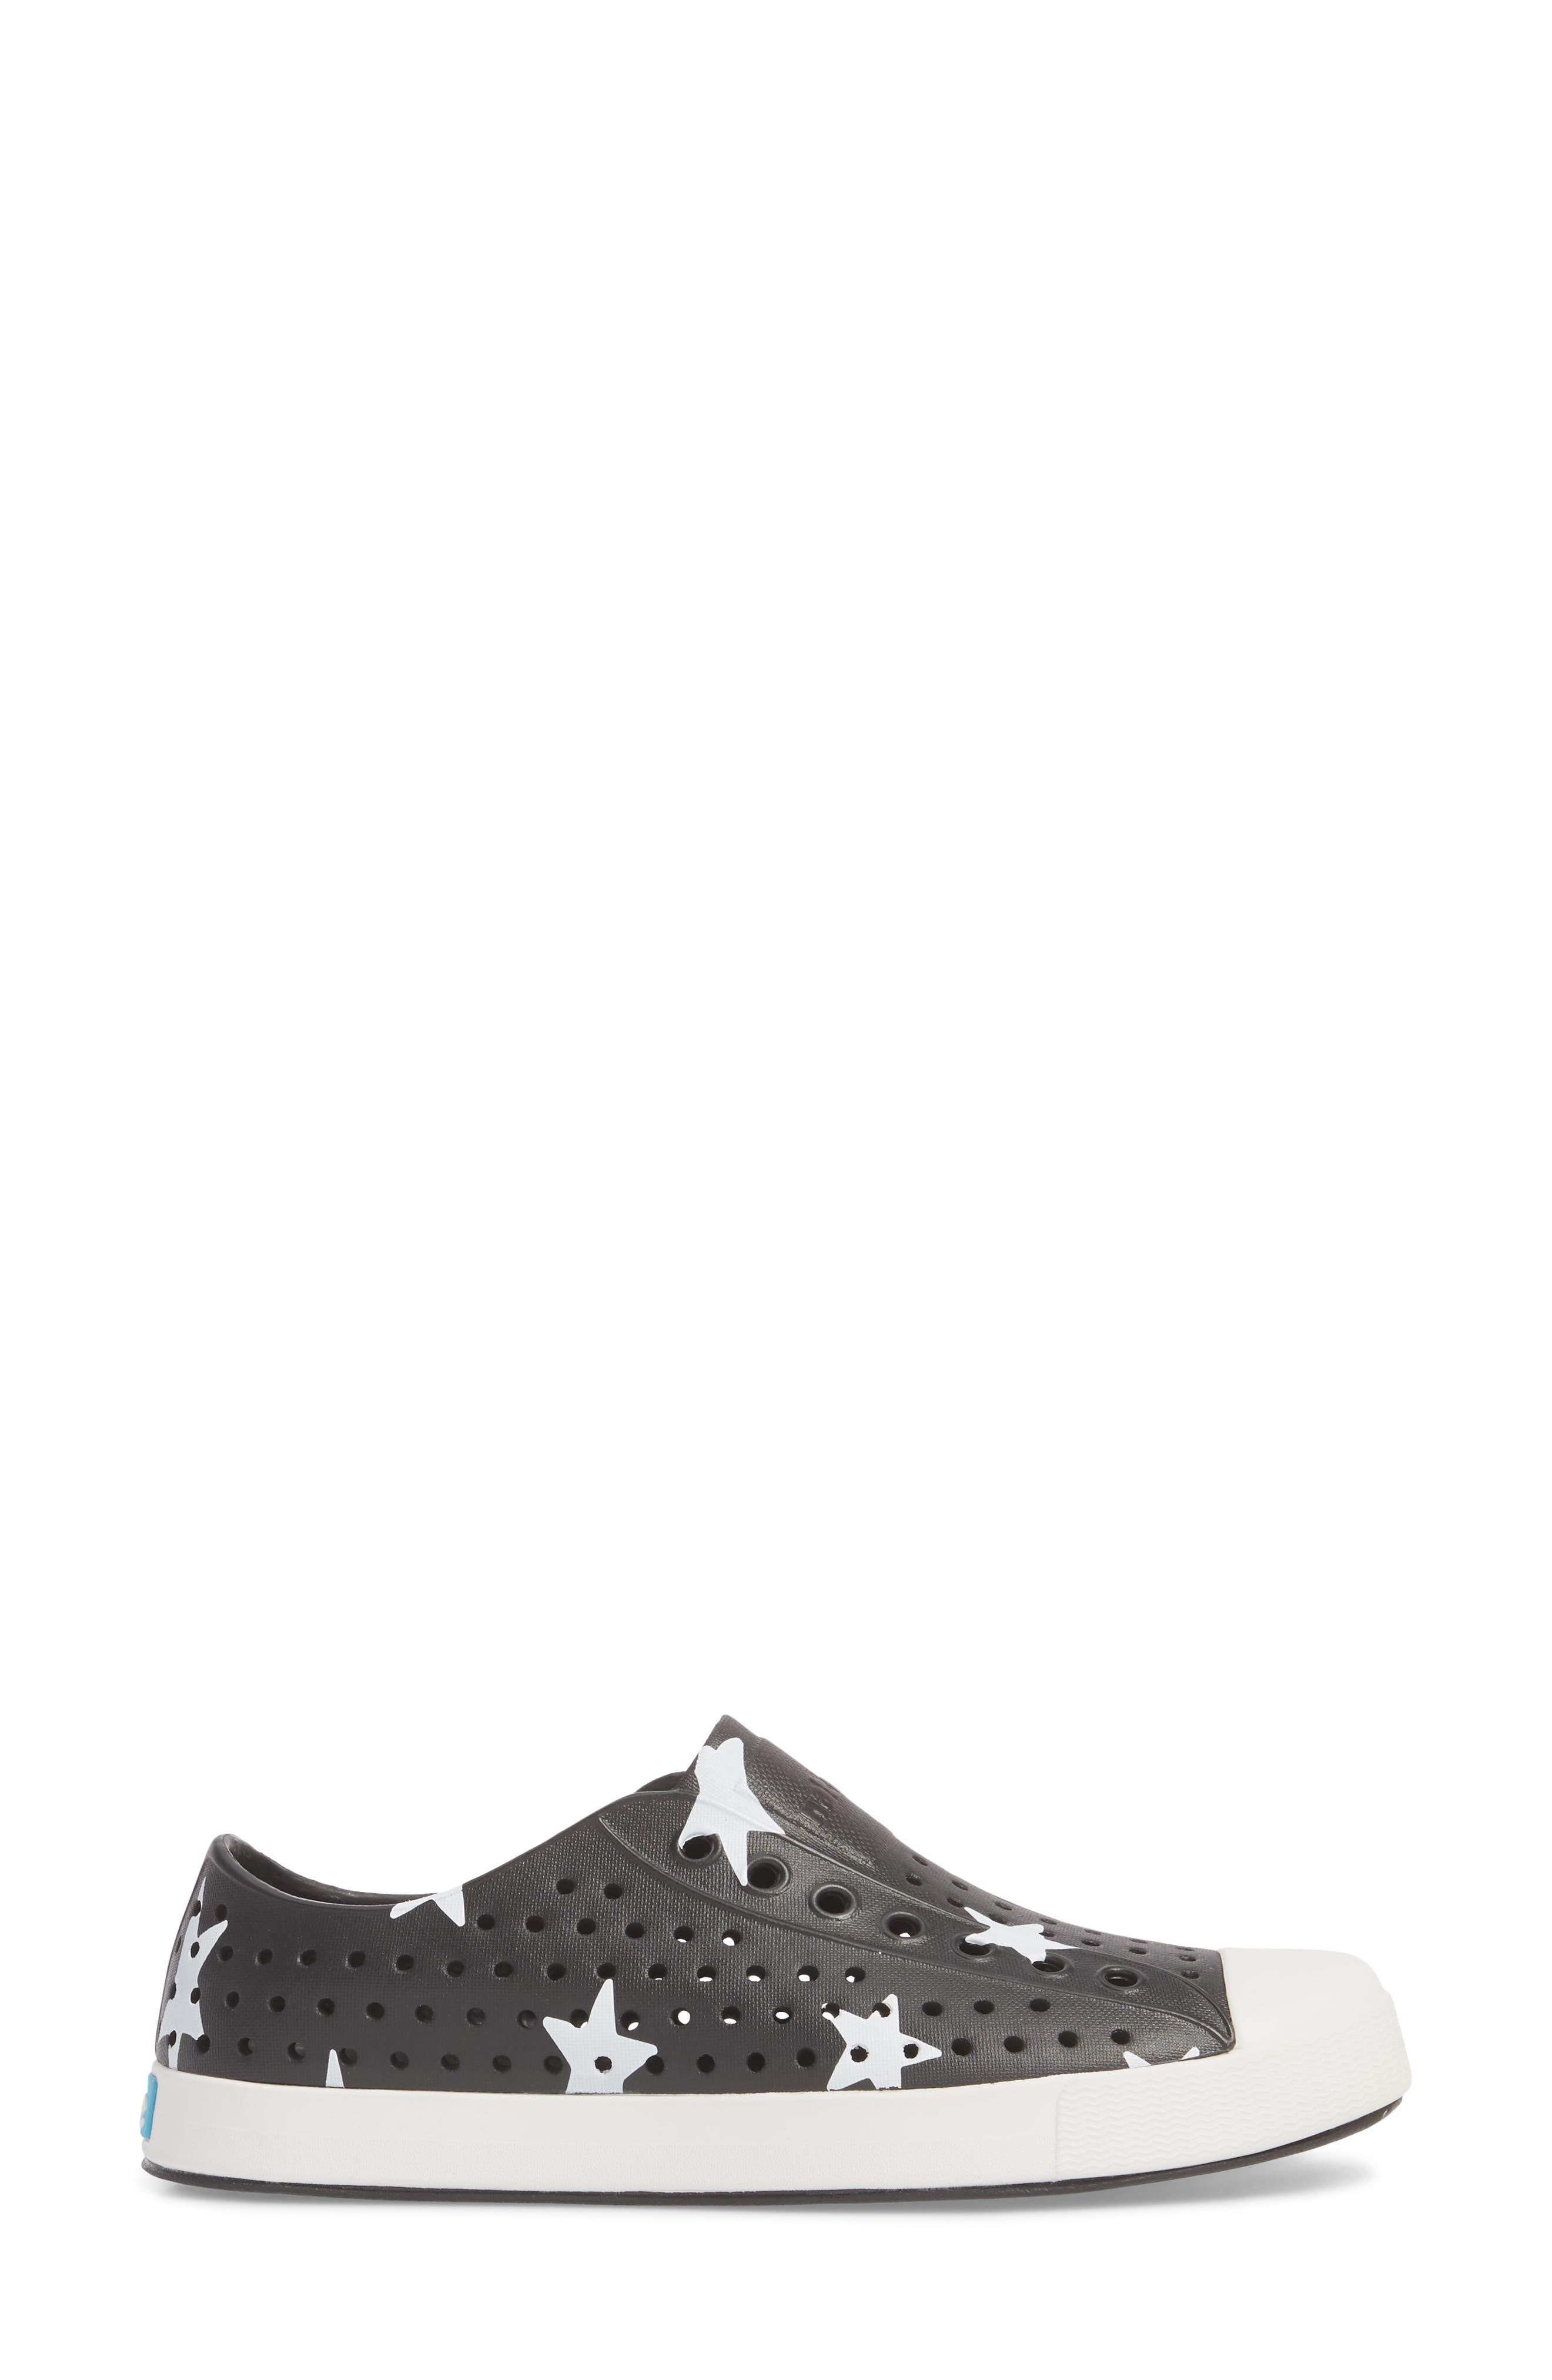 'Jefferson' Printed Slip-On Sneaker,                             Alternate thumbnail 3, color,                             Jiffy Black/ White/ Big Star